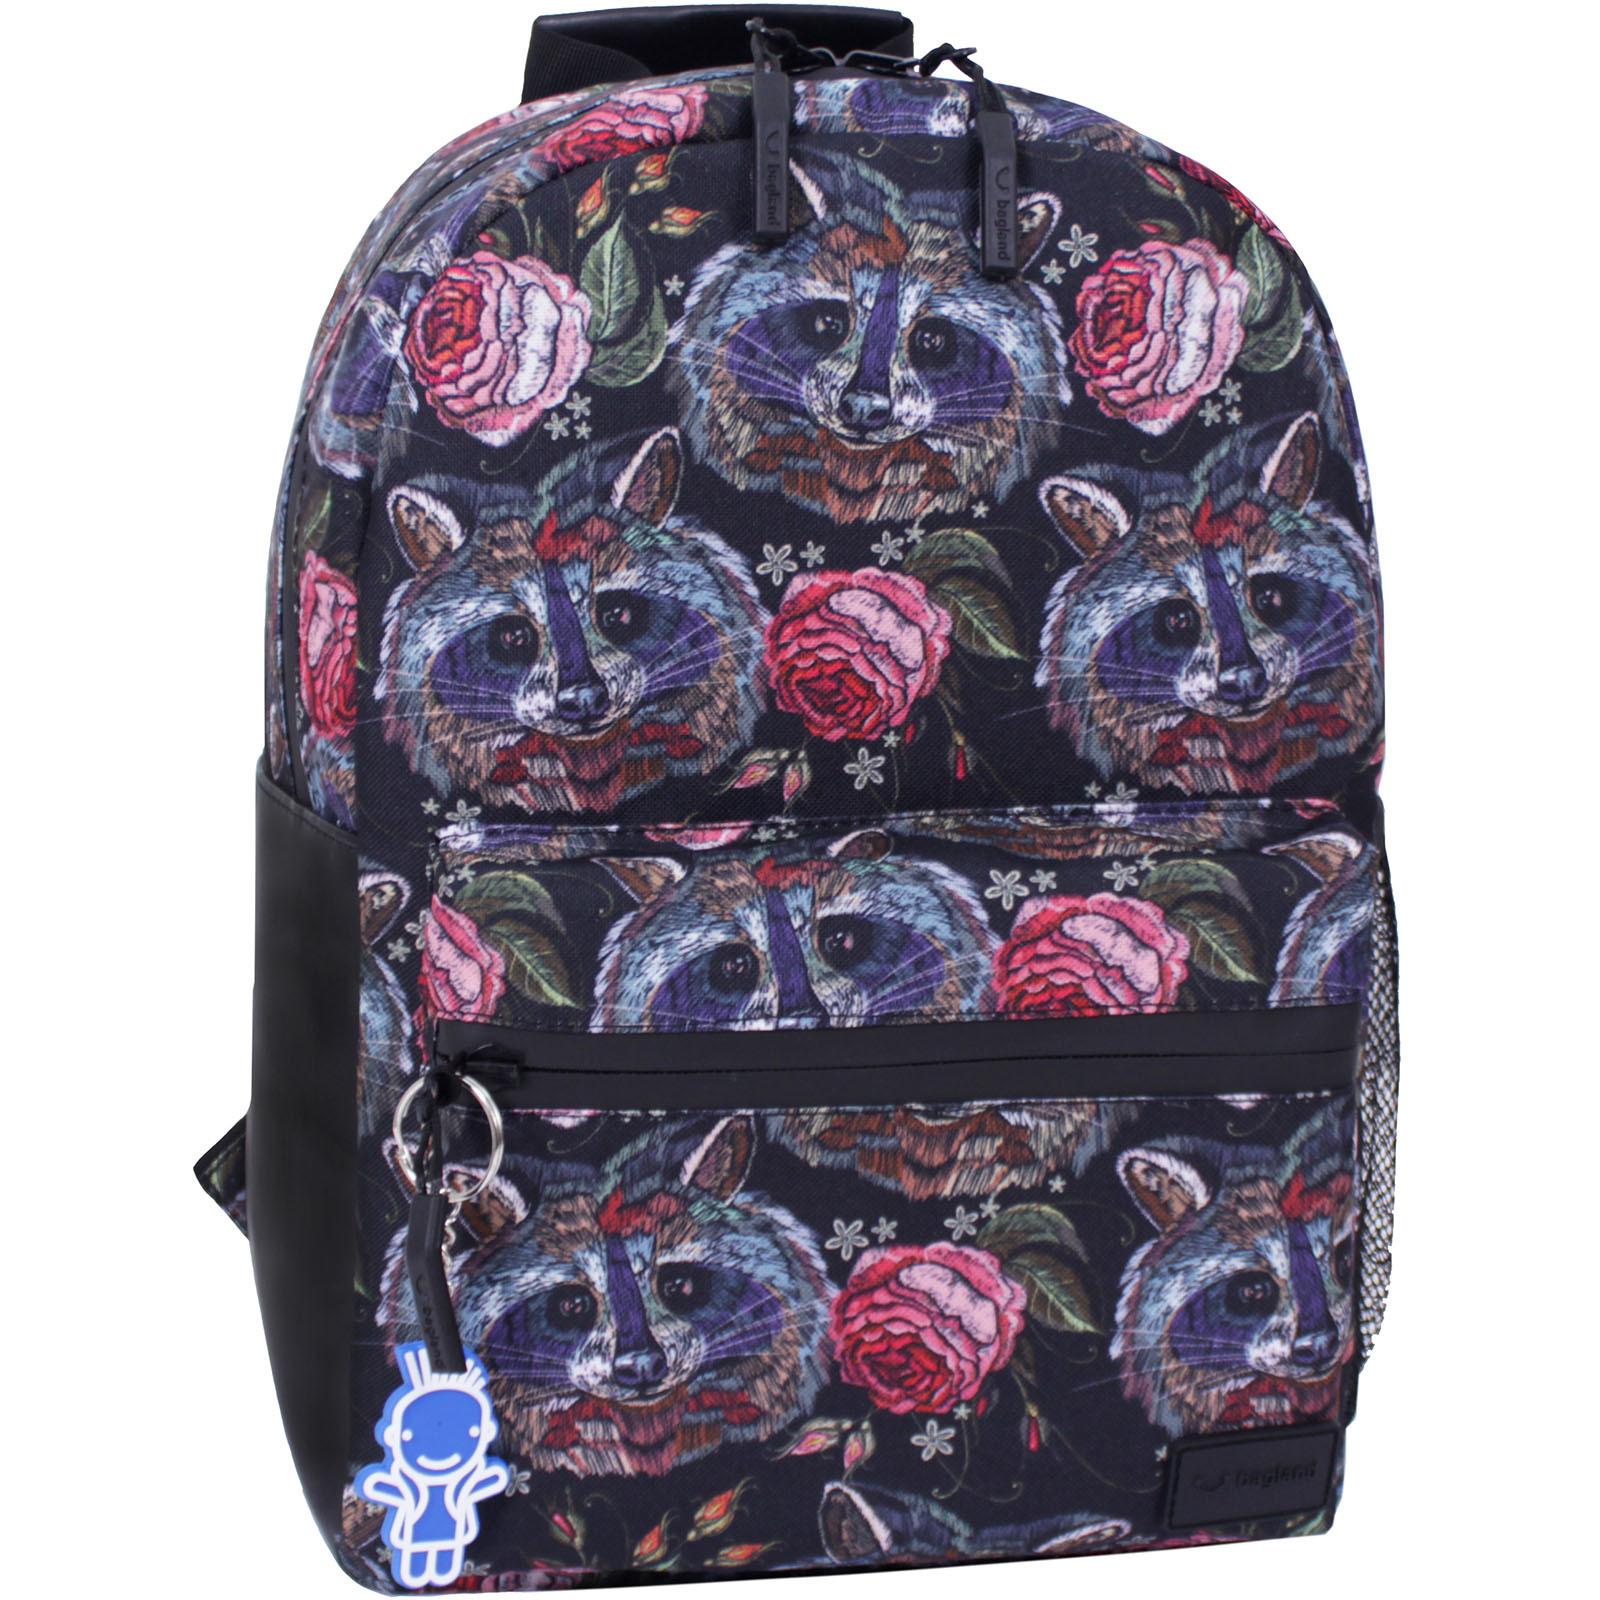 Молодежные рюкзаки Рюкзак Bagland  Frost 13 л. сублимация 477 (005406640) IMG_3565_суб.477_.JPG